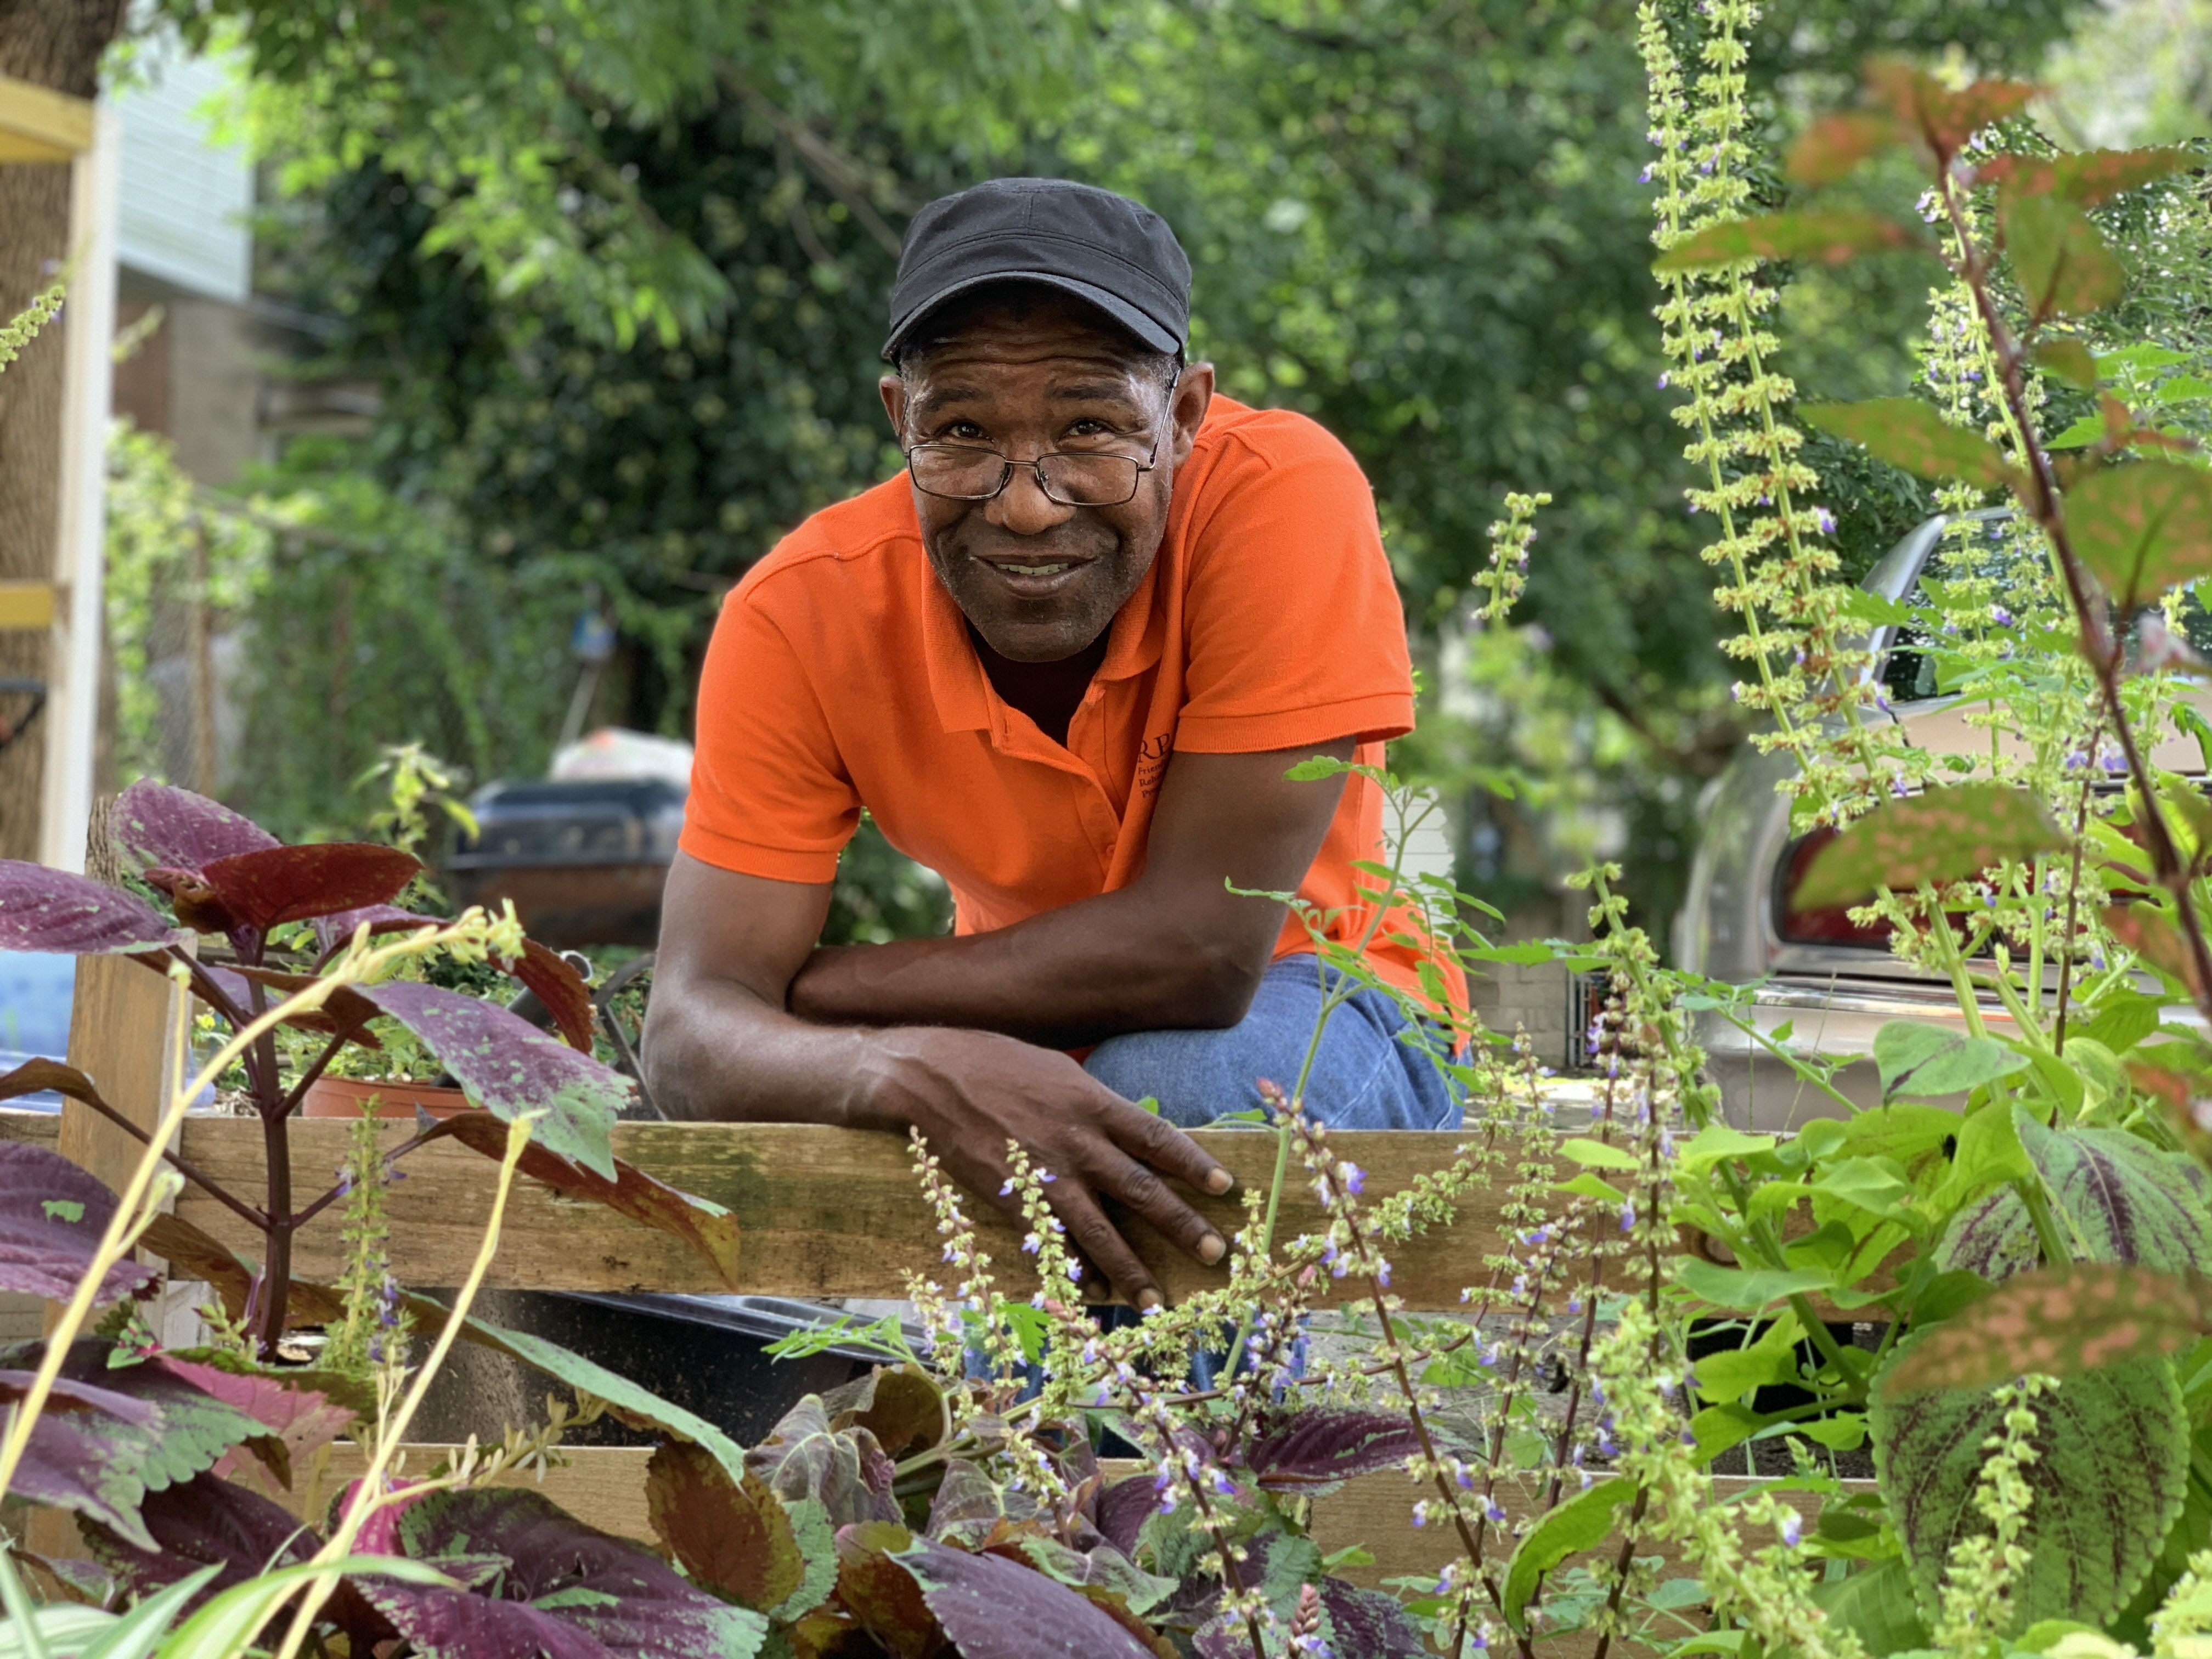 a man stands in front of a neighborhood garden